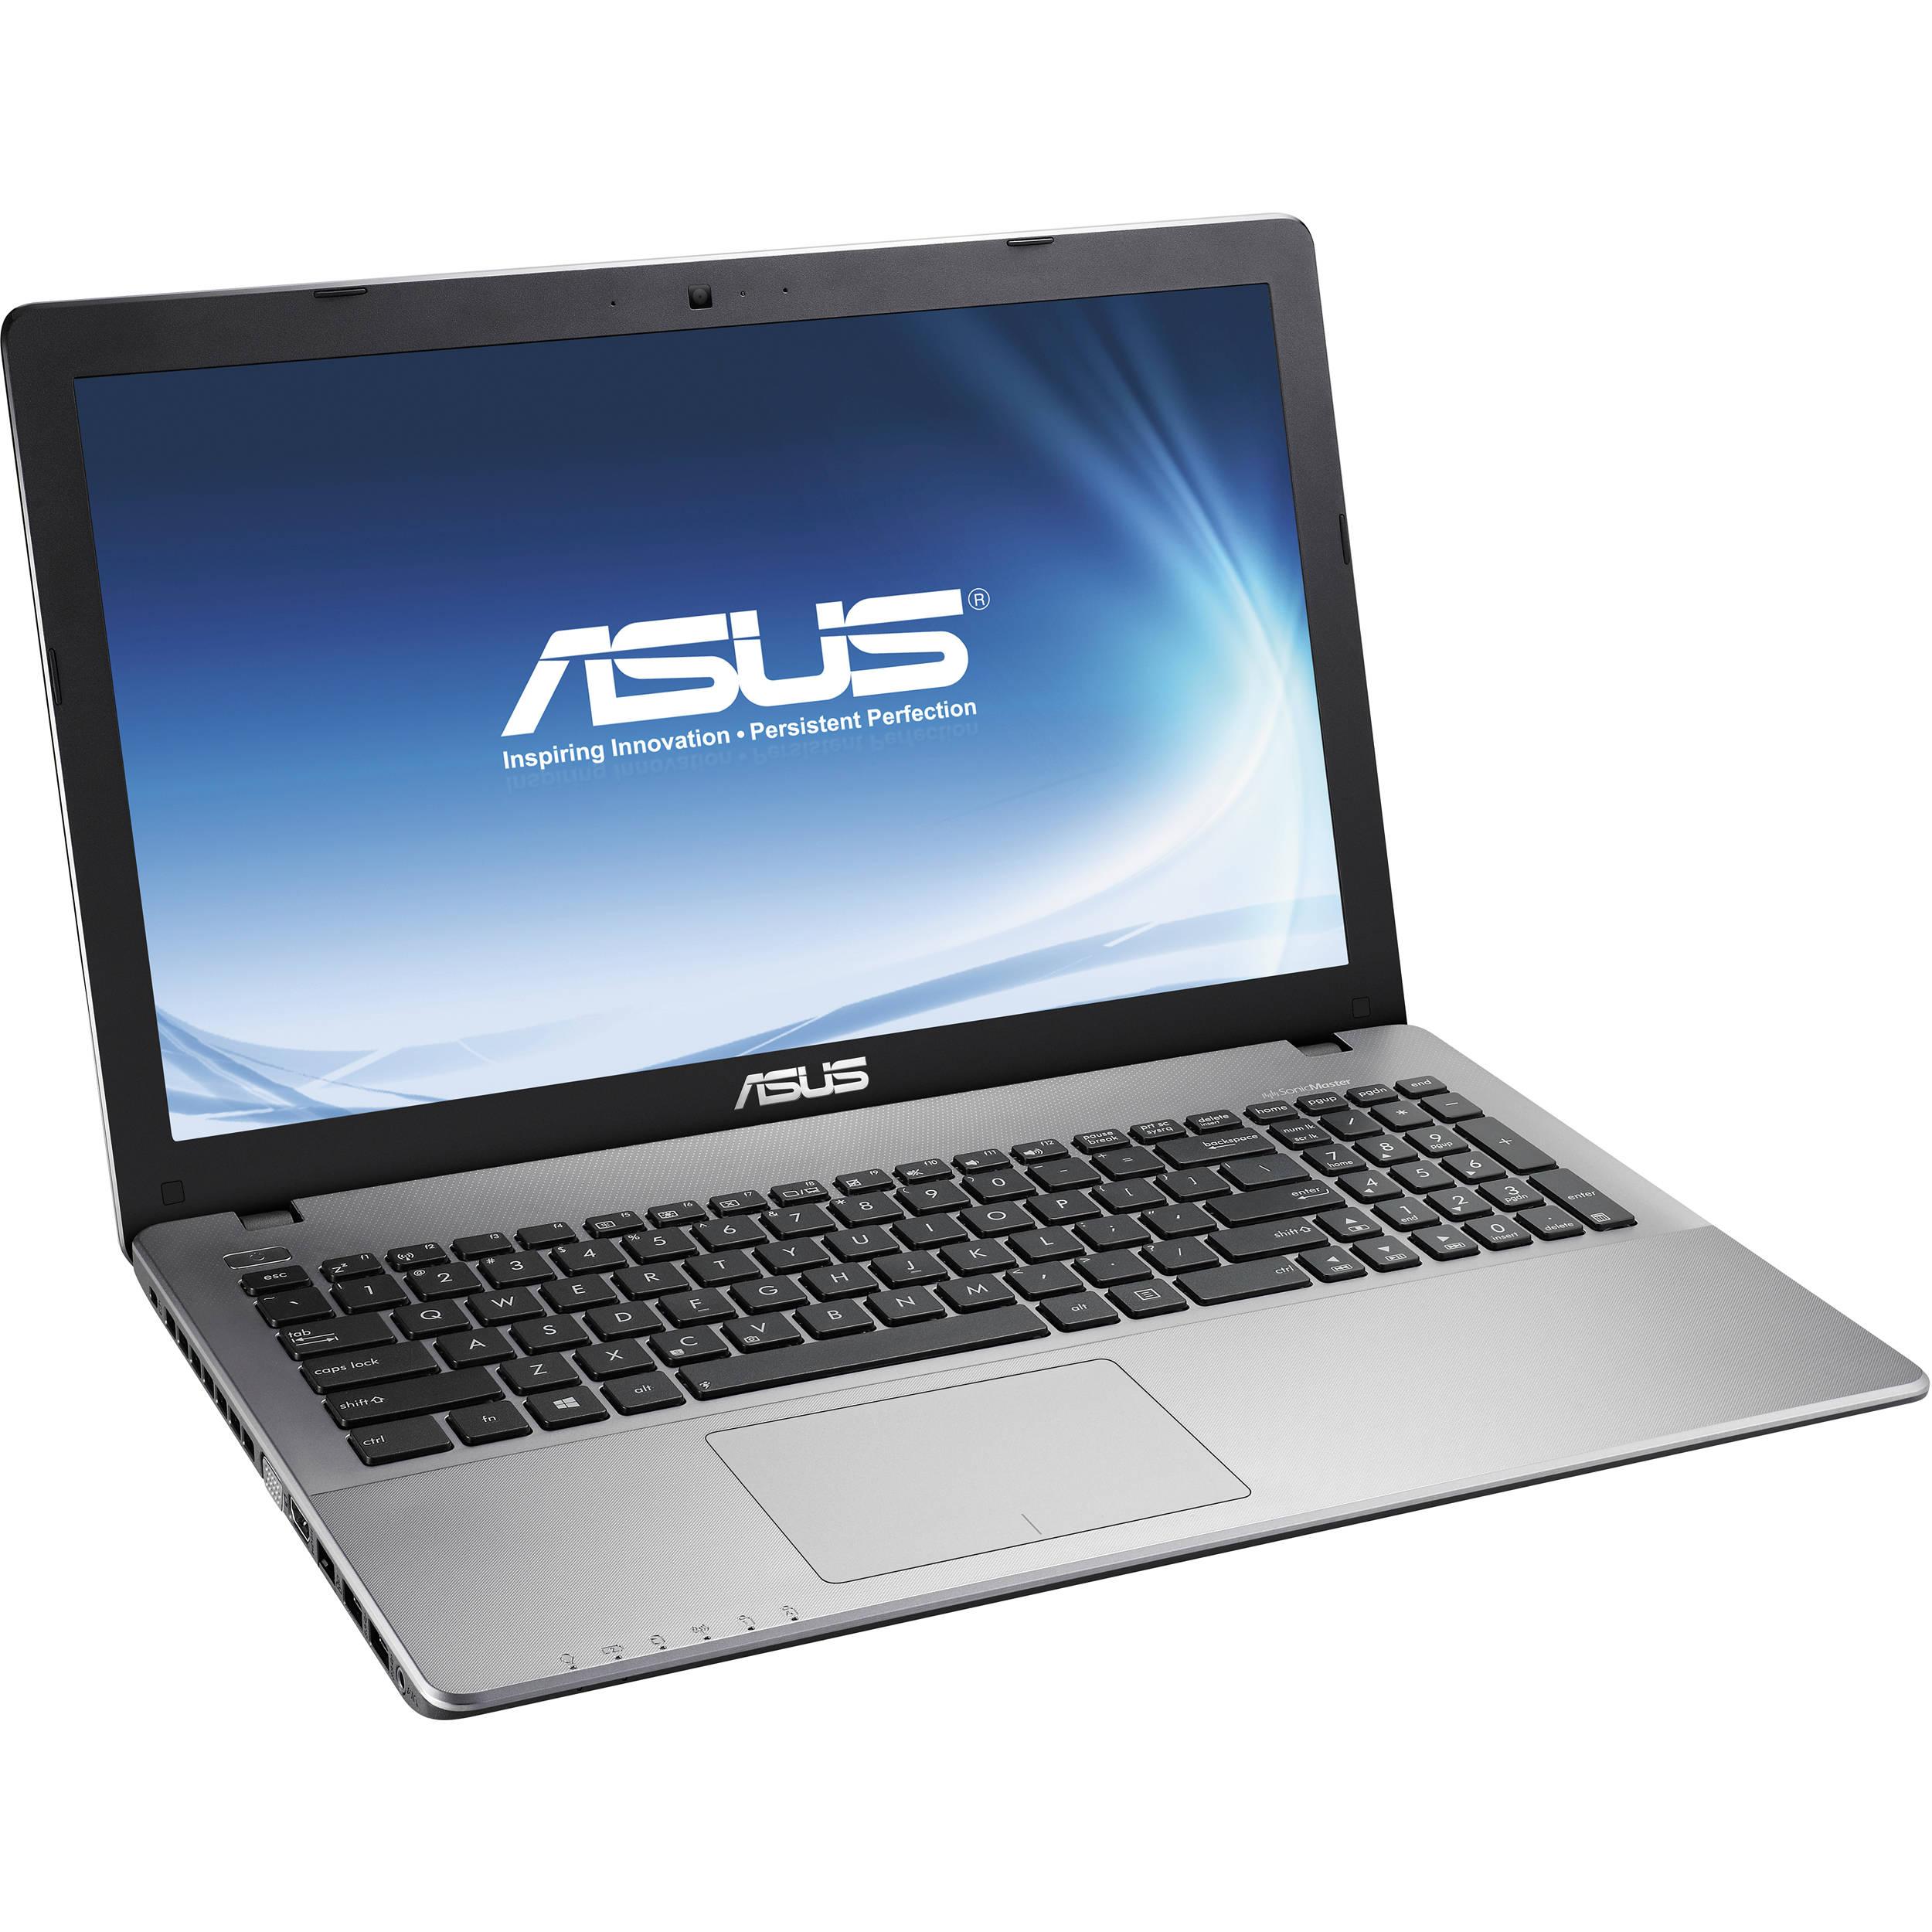 Asus R510dp Wh11 15 6 Laptop Computer R510dp Wh11 B H